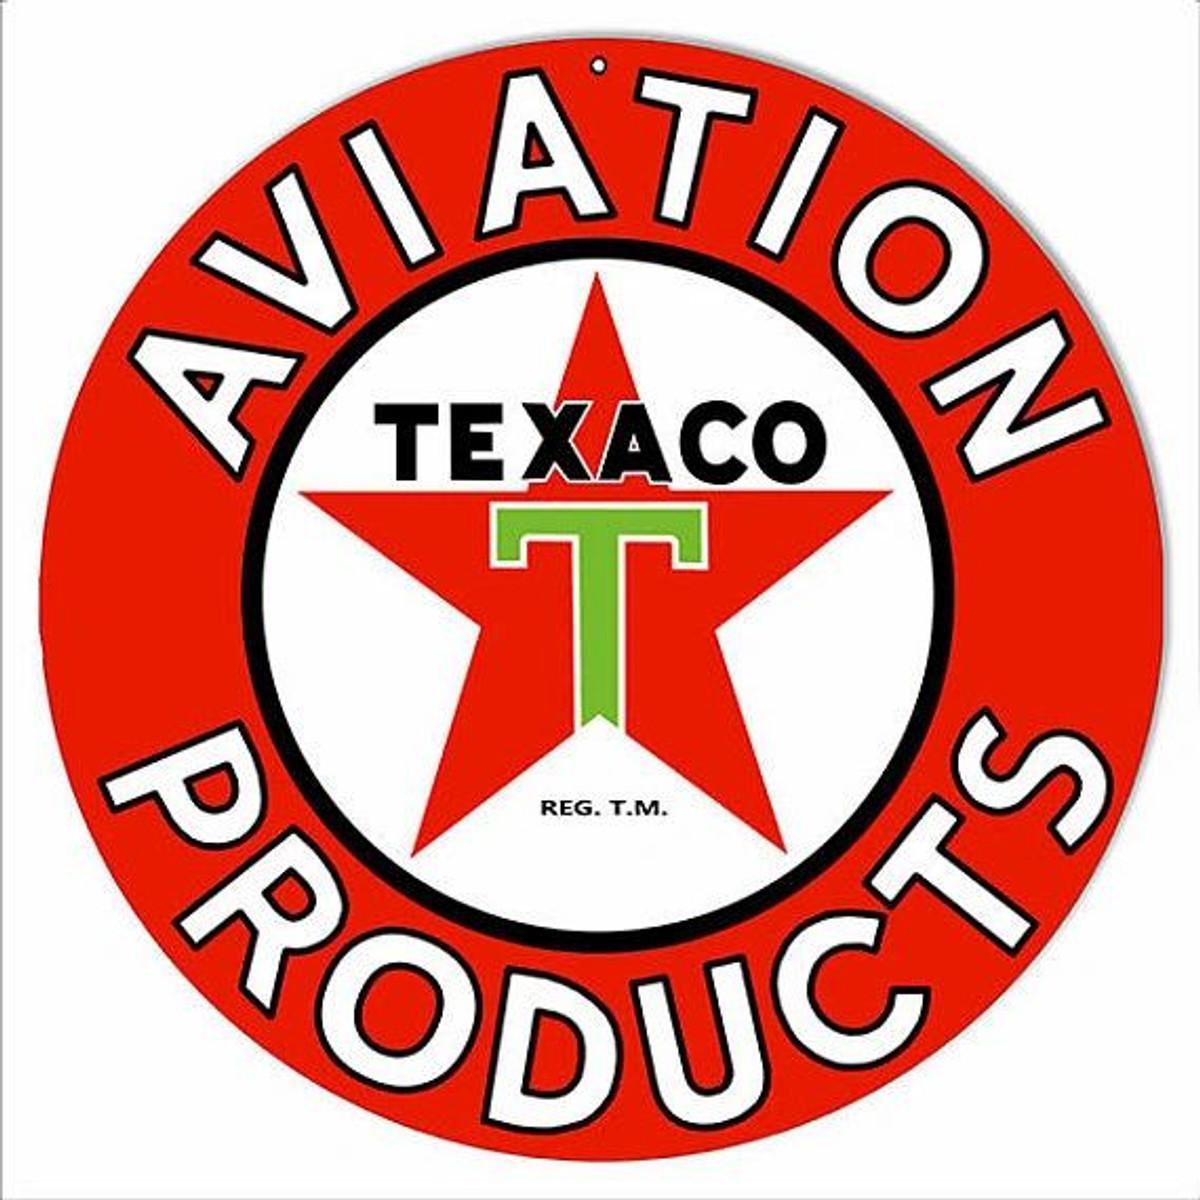 "Repro 1950s Nostalgic Texaco Aviation Restroom Key Fob Hanger with Fobs measures 12"" X 15""."